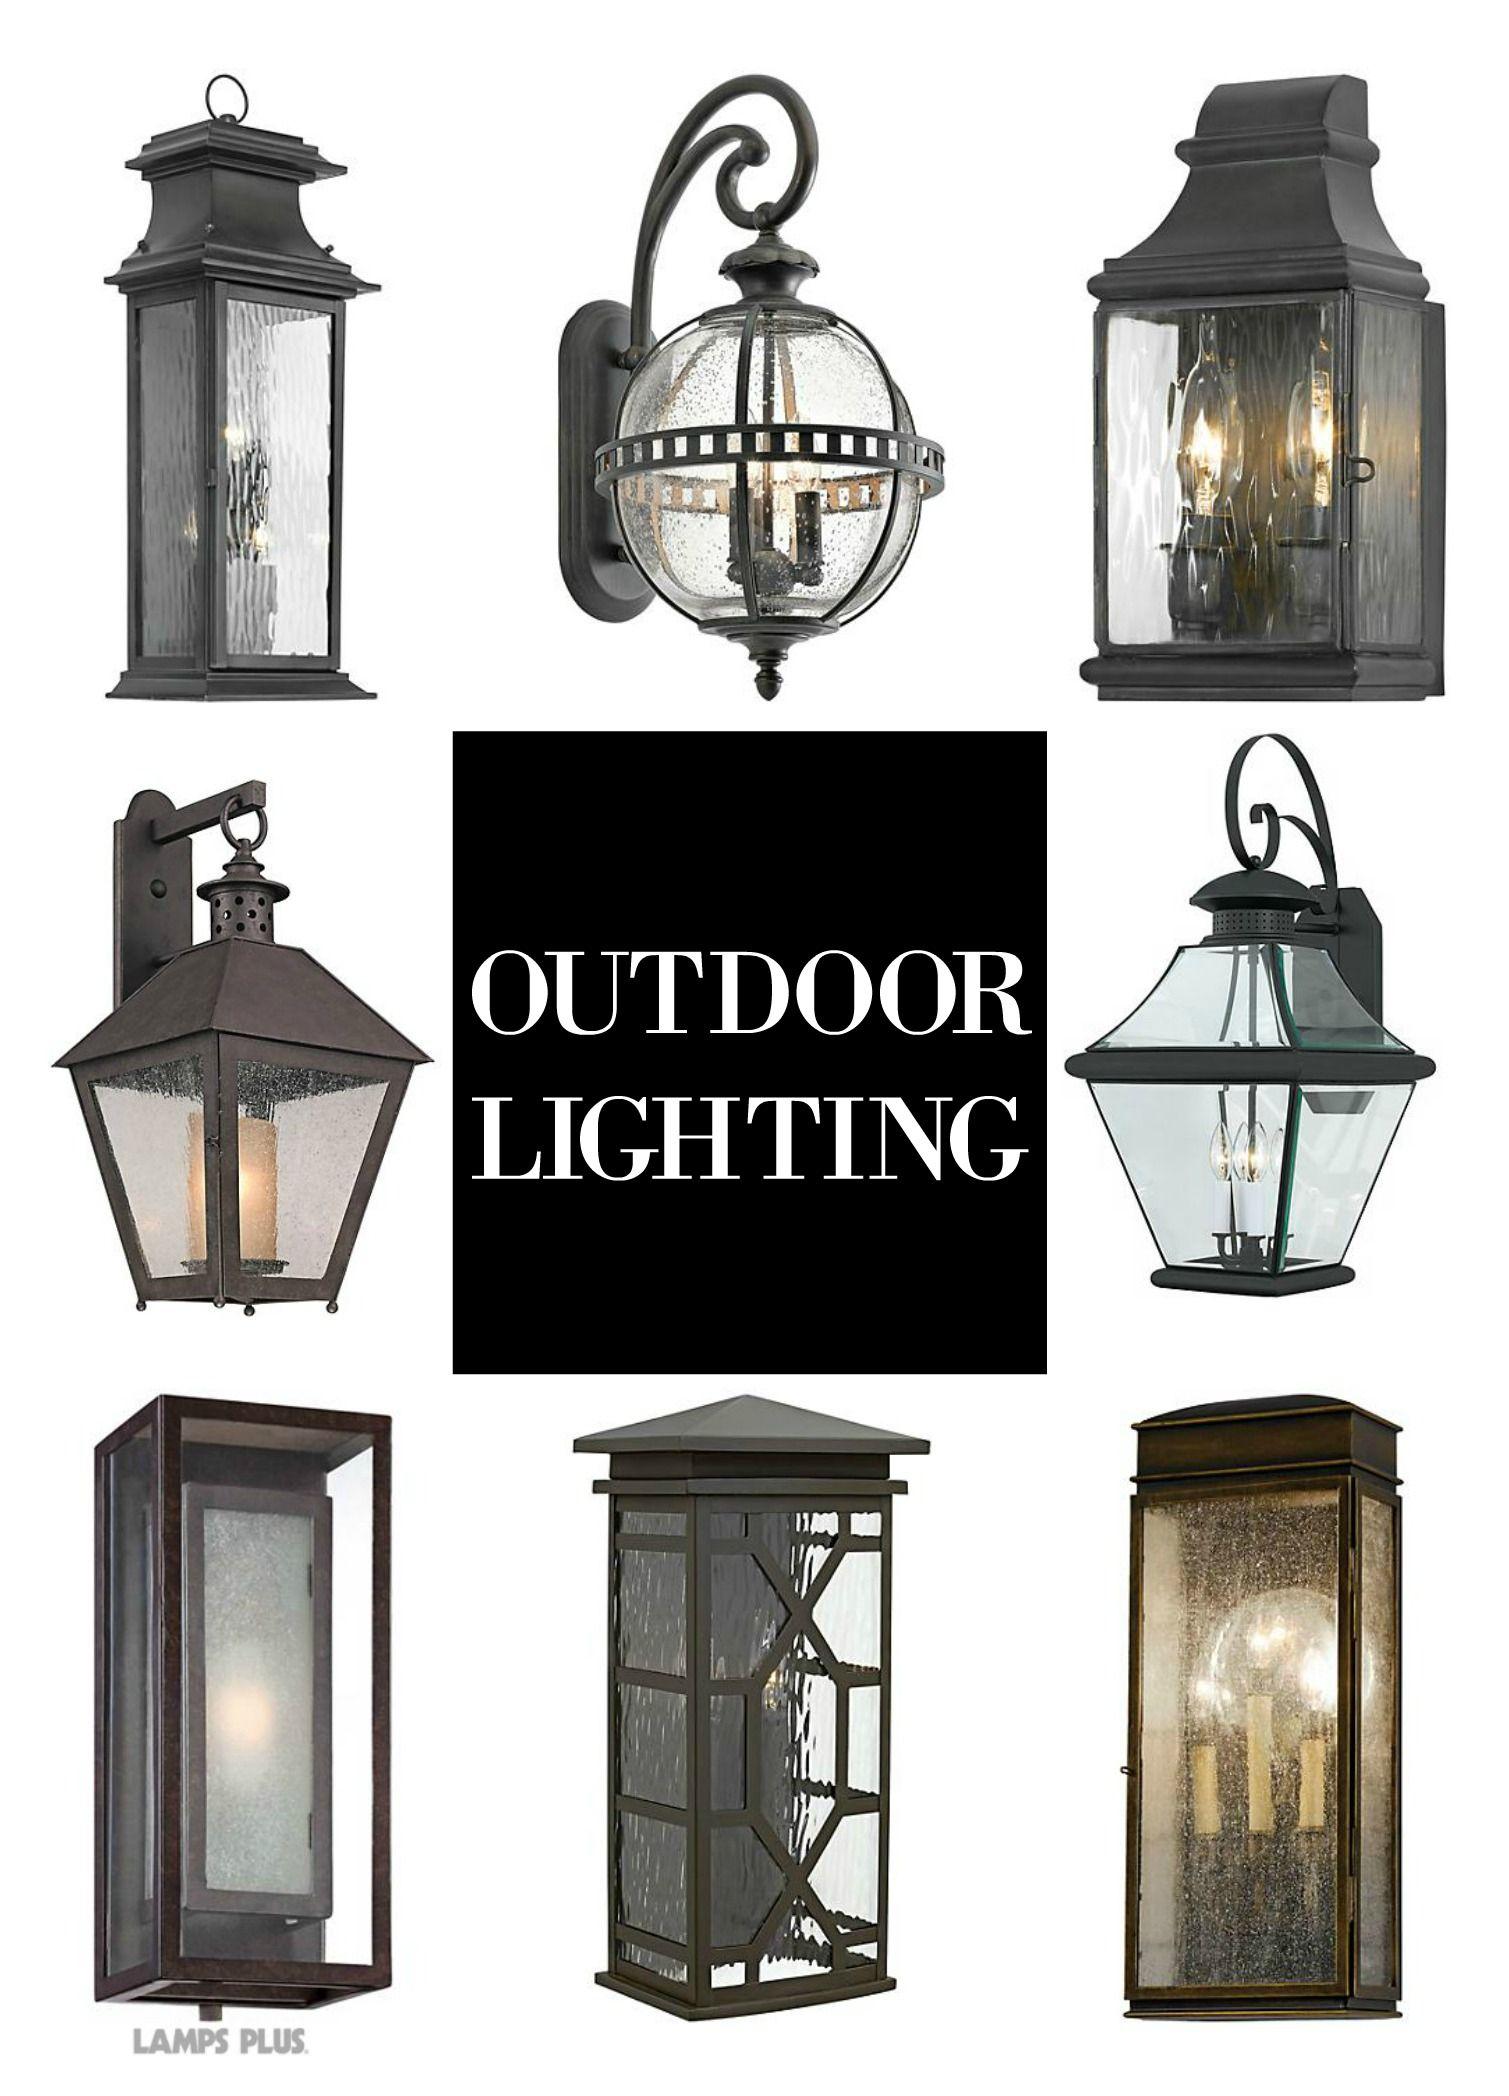 Outdoor lighting lantern wall sconces perfect for a front outdoor lighting lantern wall sconces perfect for a front entry to your backyard paradise aloadofball Choice Image